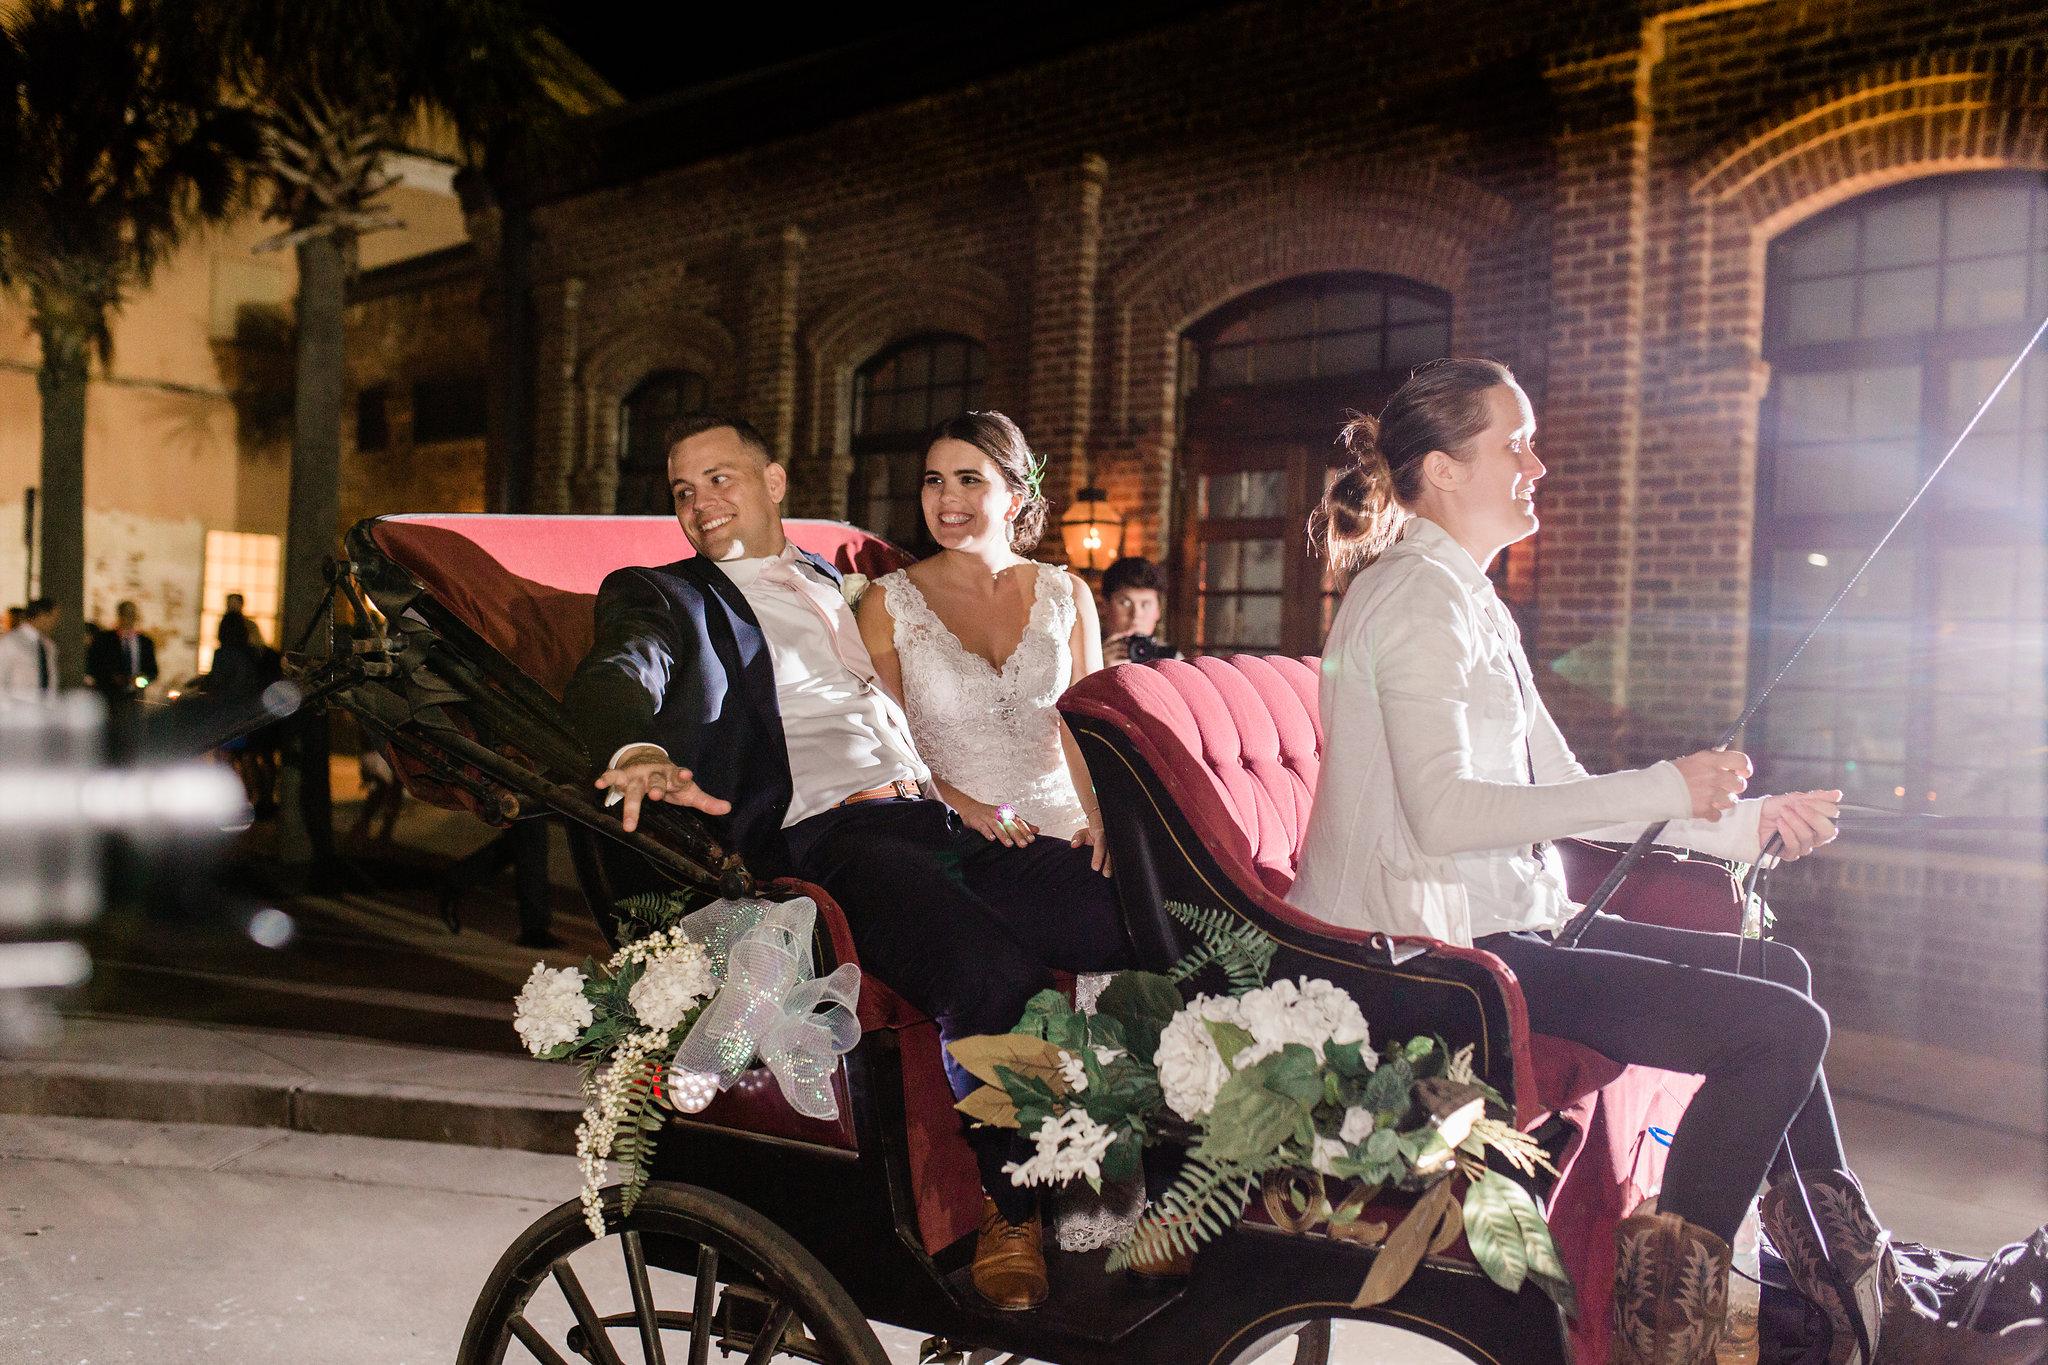 apt-b-photography-Savannah-wedding-photographer-savannah-engagement-photographer-historic-savannah-engagement-charles-h-morris-center-wedding-savannah-weddings-52.JPG